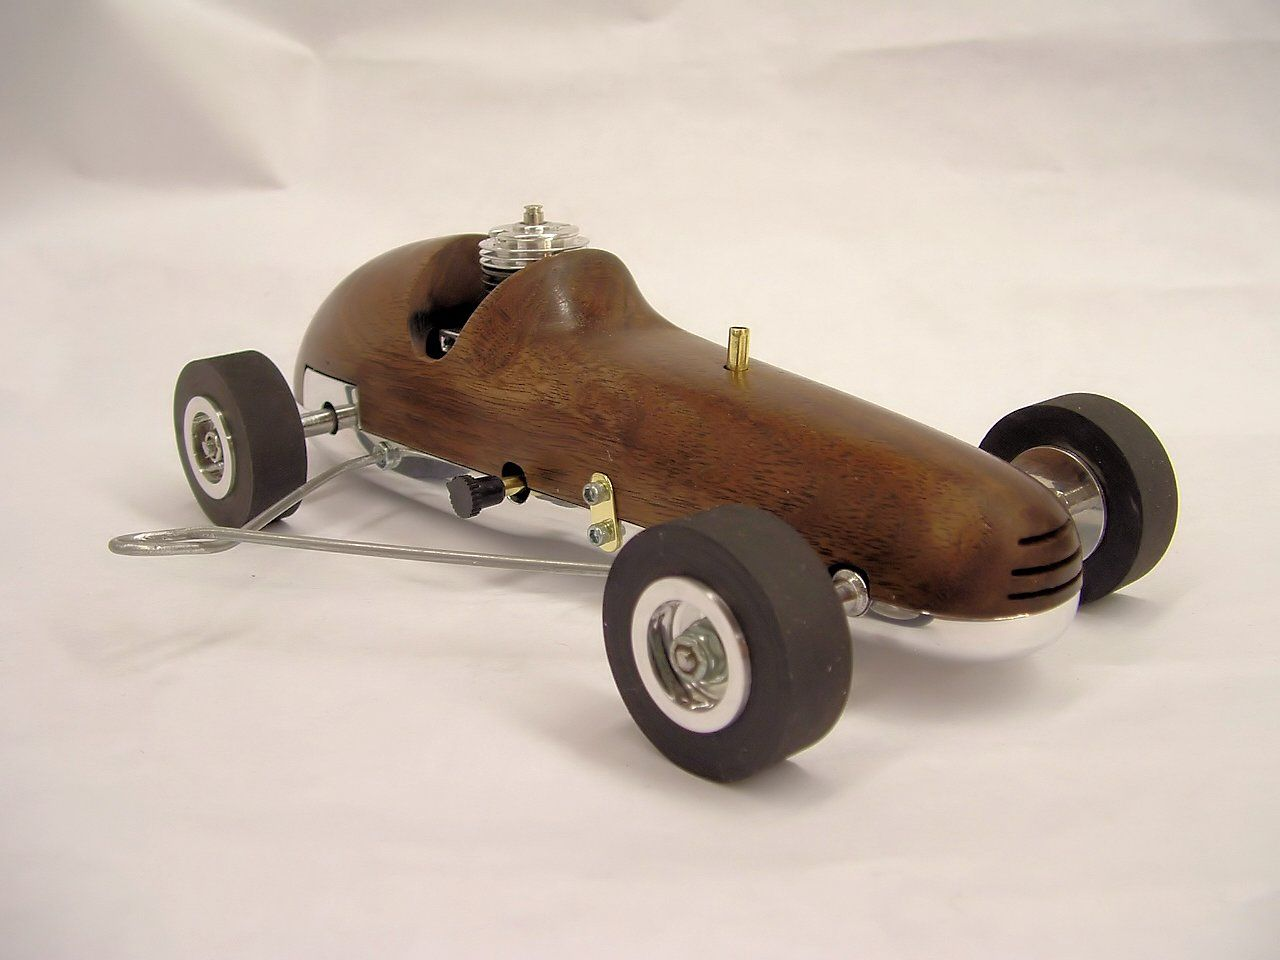 Midget slot car-3770